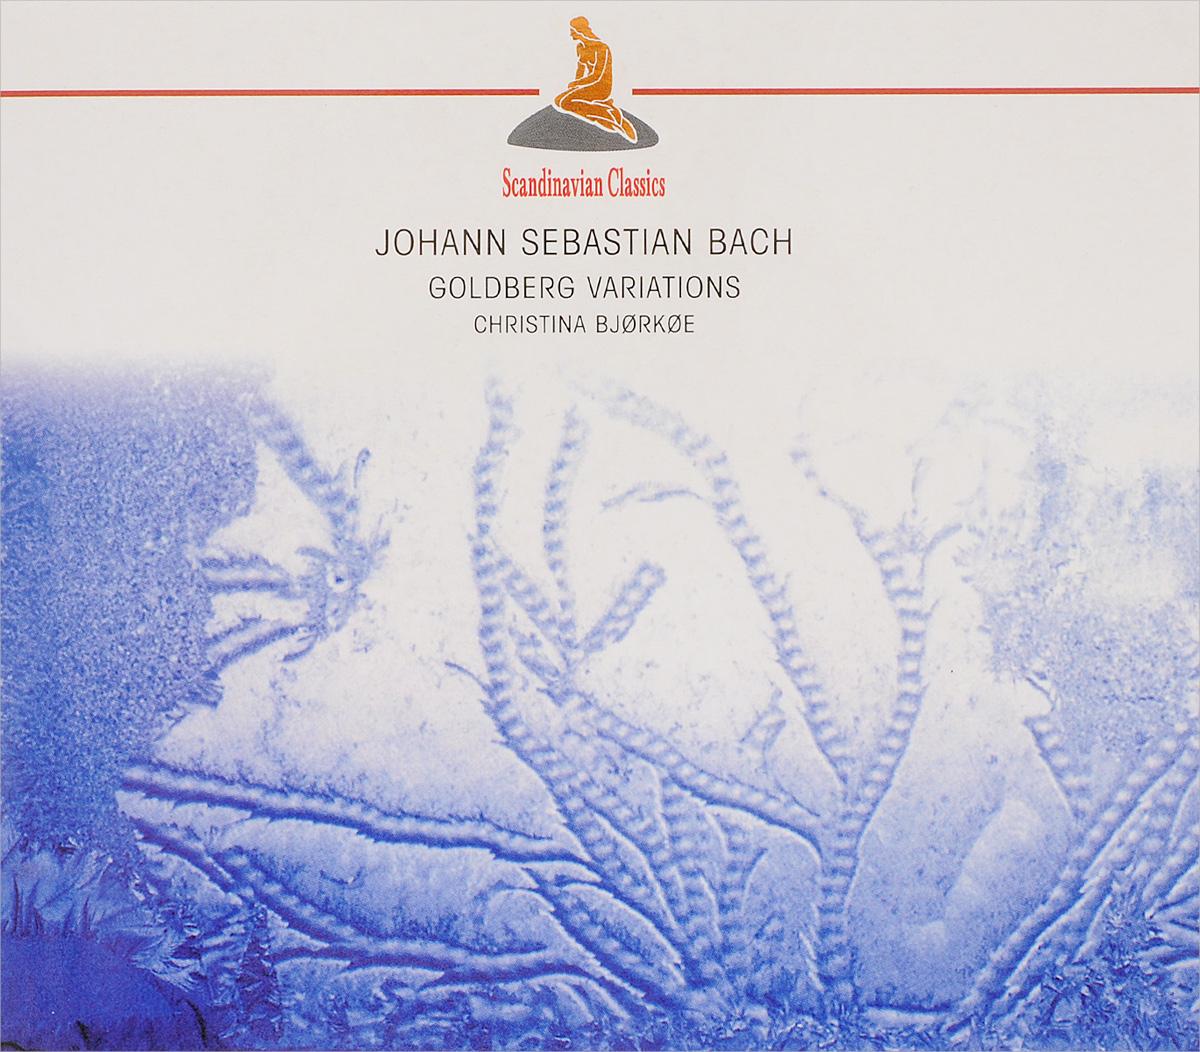 Christina Bjorkoe Scandinavian Classics. Christina Bjorkoe. Johann Sebastian Bach. Goldberg Variations stefan hussong johann sebastian bach goldberg variations